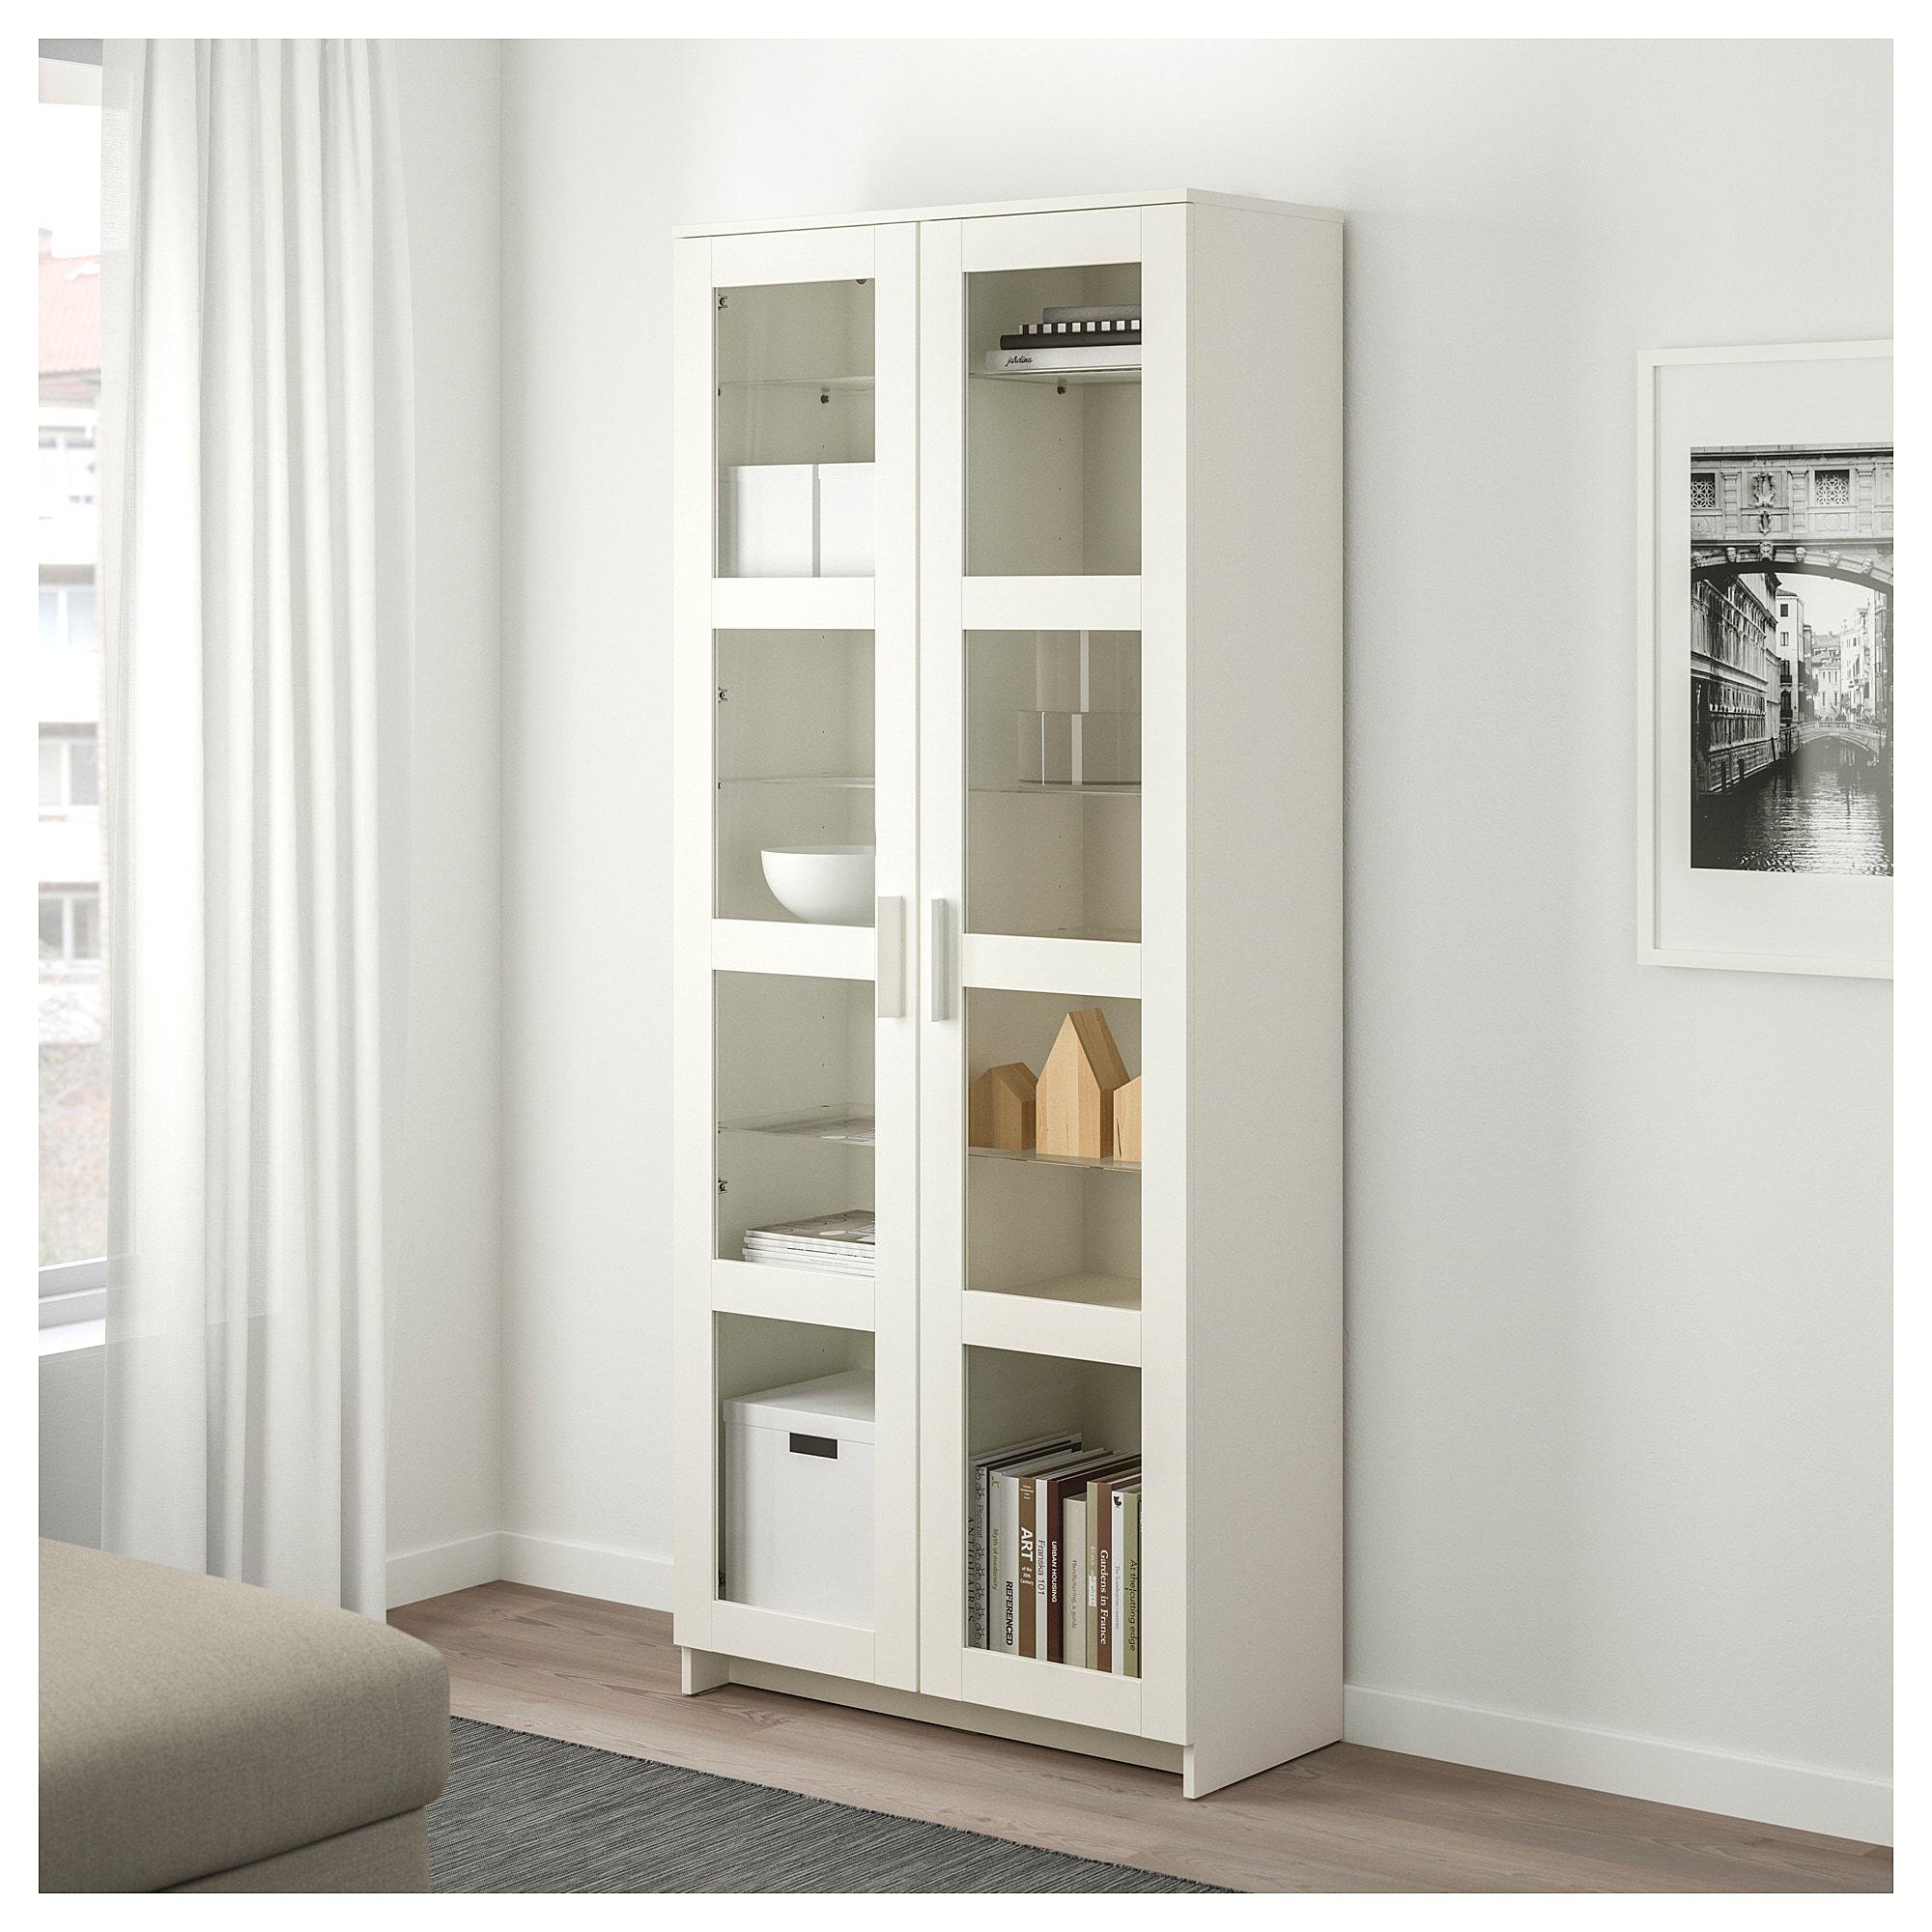 Ikea Brimnes Glass Door Cabinet White In 2019 Products